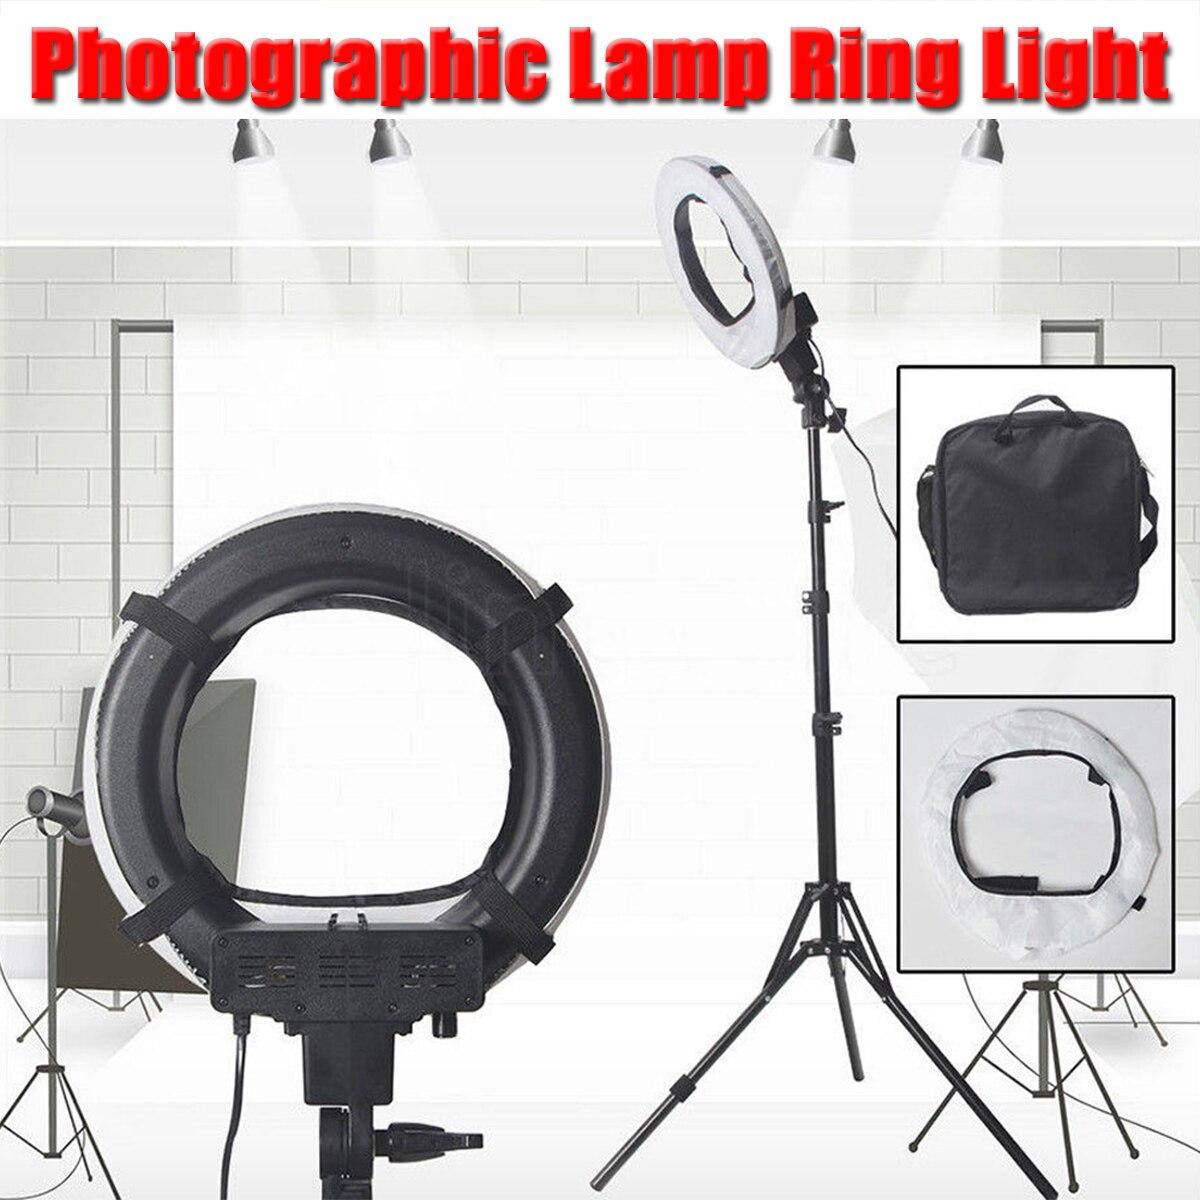 Dimmable LED Studio Camera Phone Studio Selfie Ring Light 5500K Video Ring Lamp Annular Lamp Ring Fill Lights With 190CM Tripod кольцо для селфи selfie ring light на батарейке белое